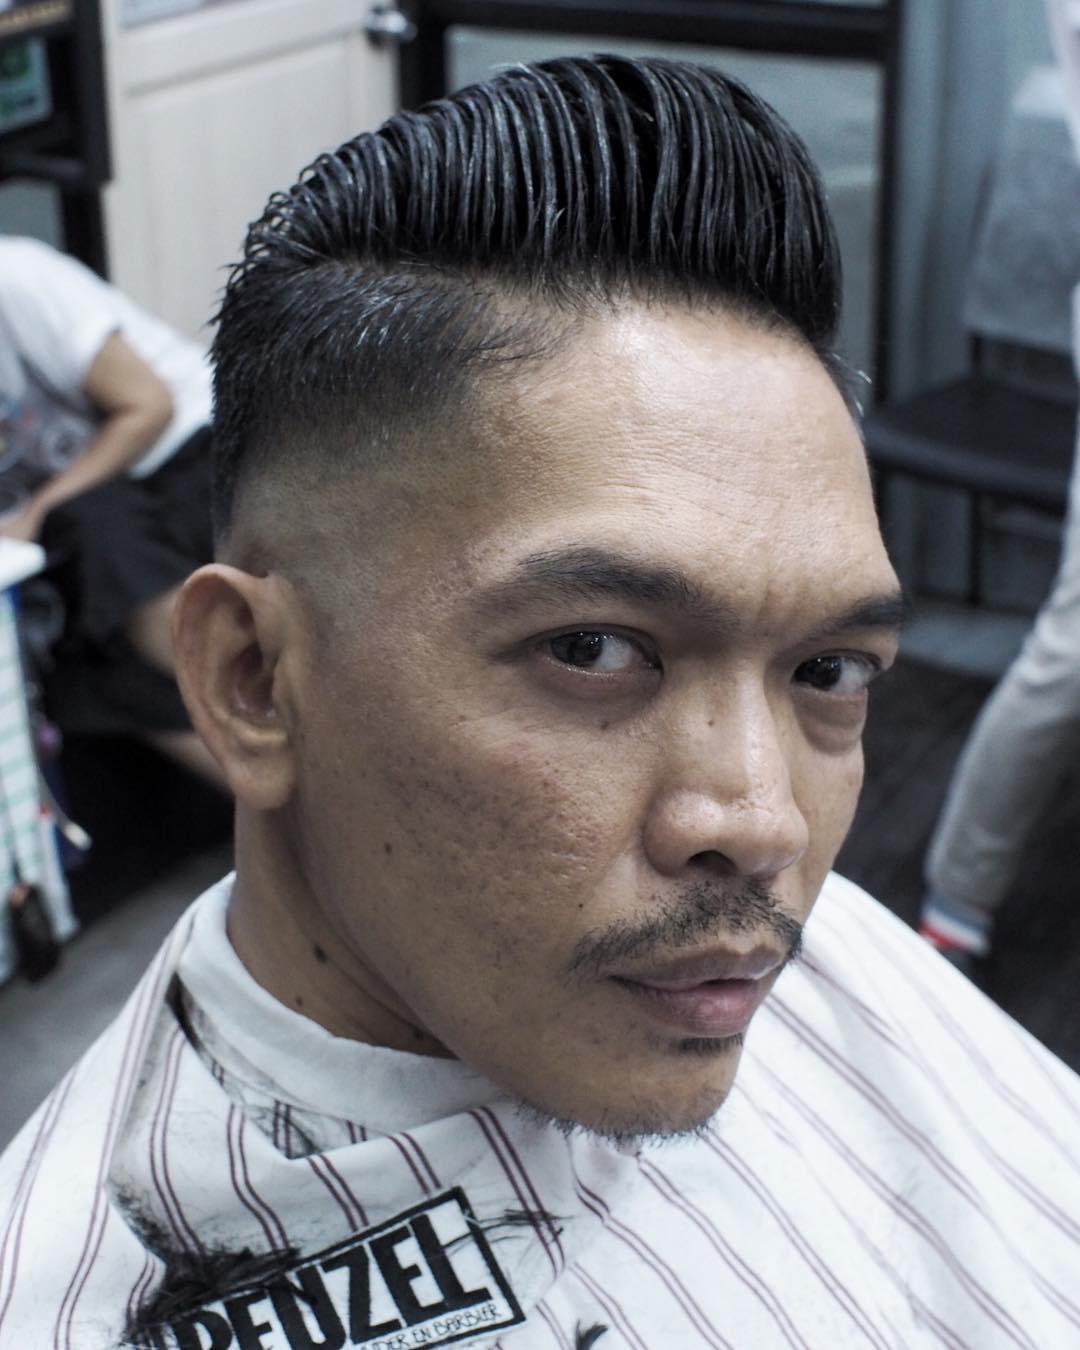 Corte-de-cabelo-pompadour-Cortes-de-cabelo-atuais-masculinos